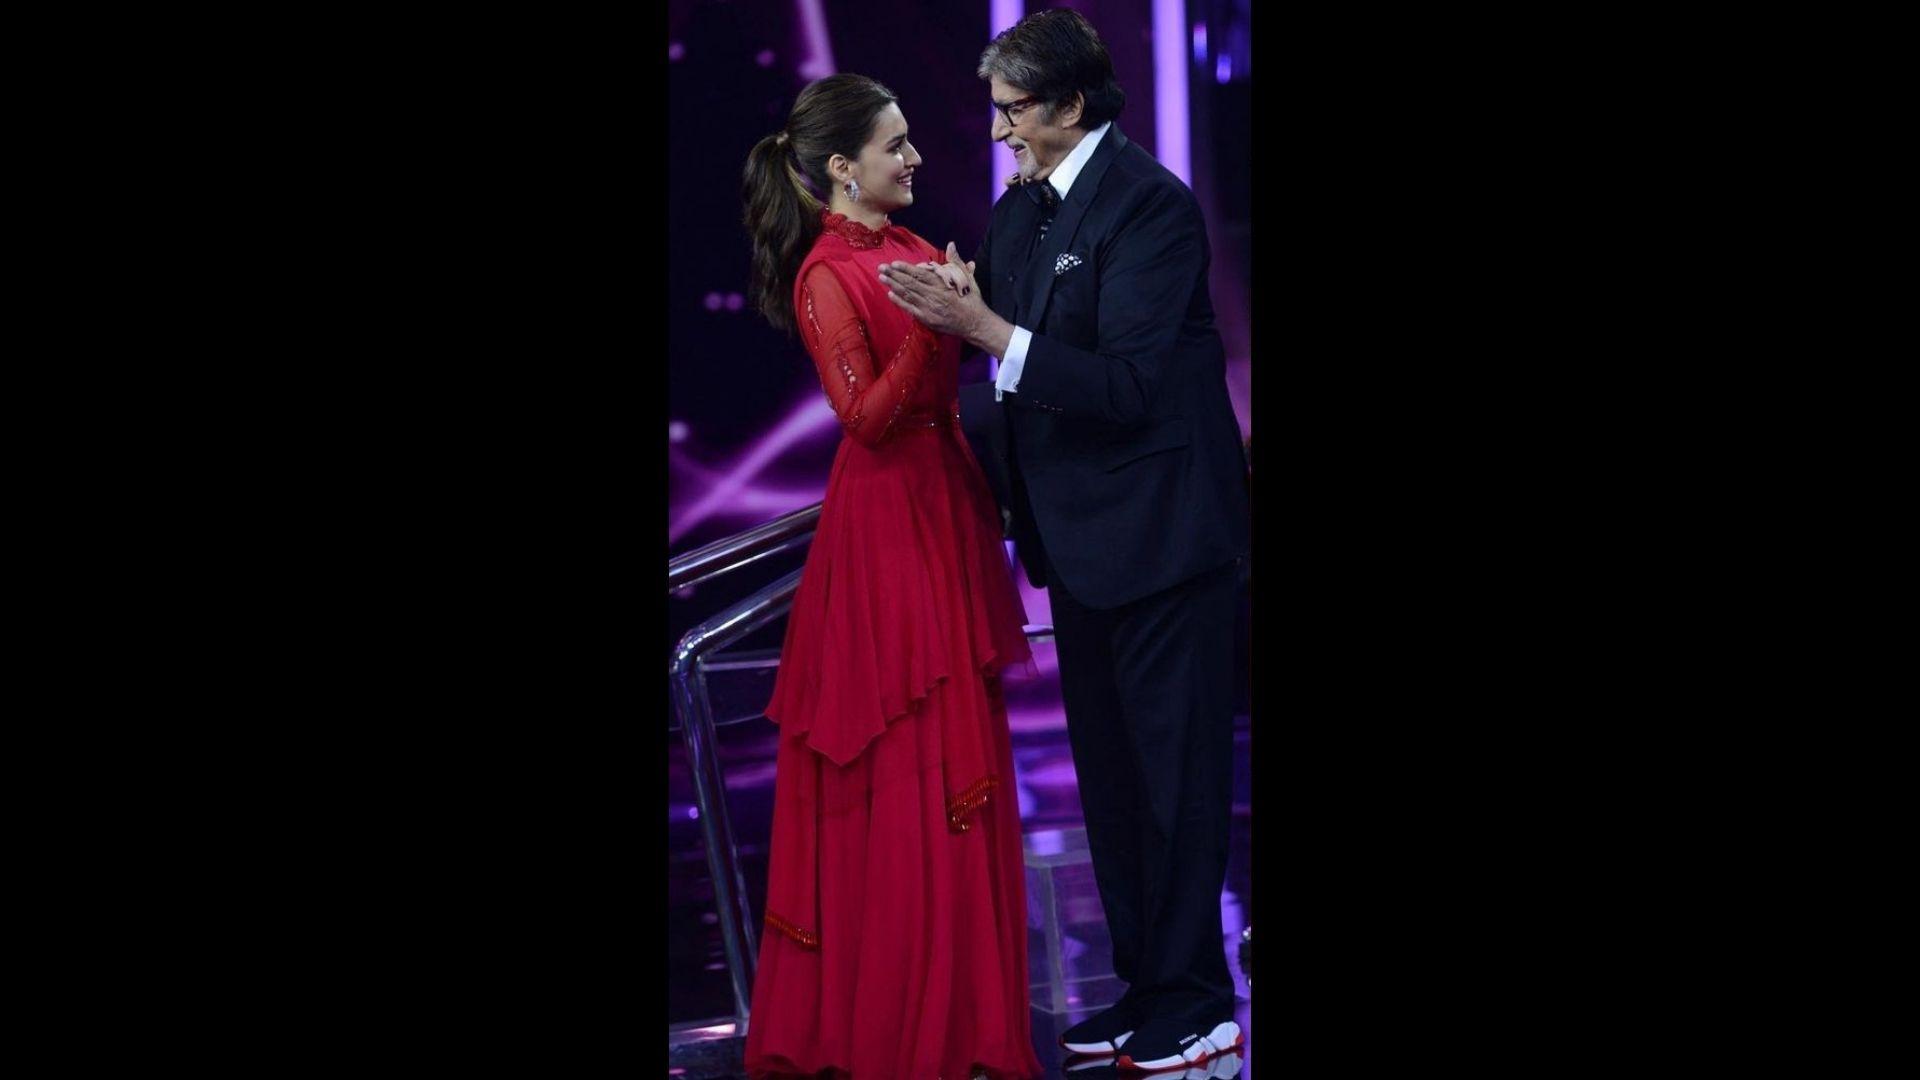 Amitabh Bachchan And Kriti Sanon's Dance Video Will Make Your Hearts Warm; Megastar Pens Down An Amazing Caption